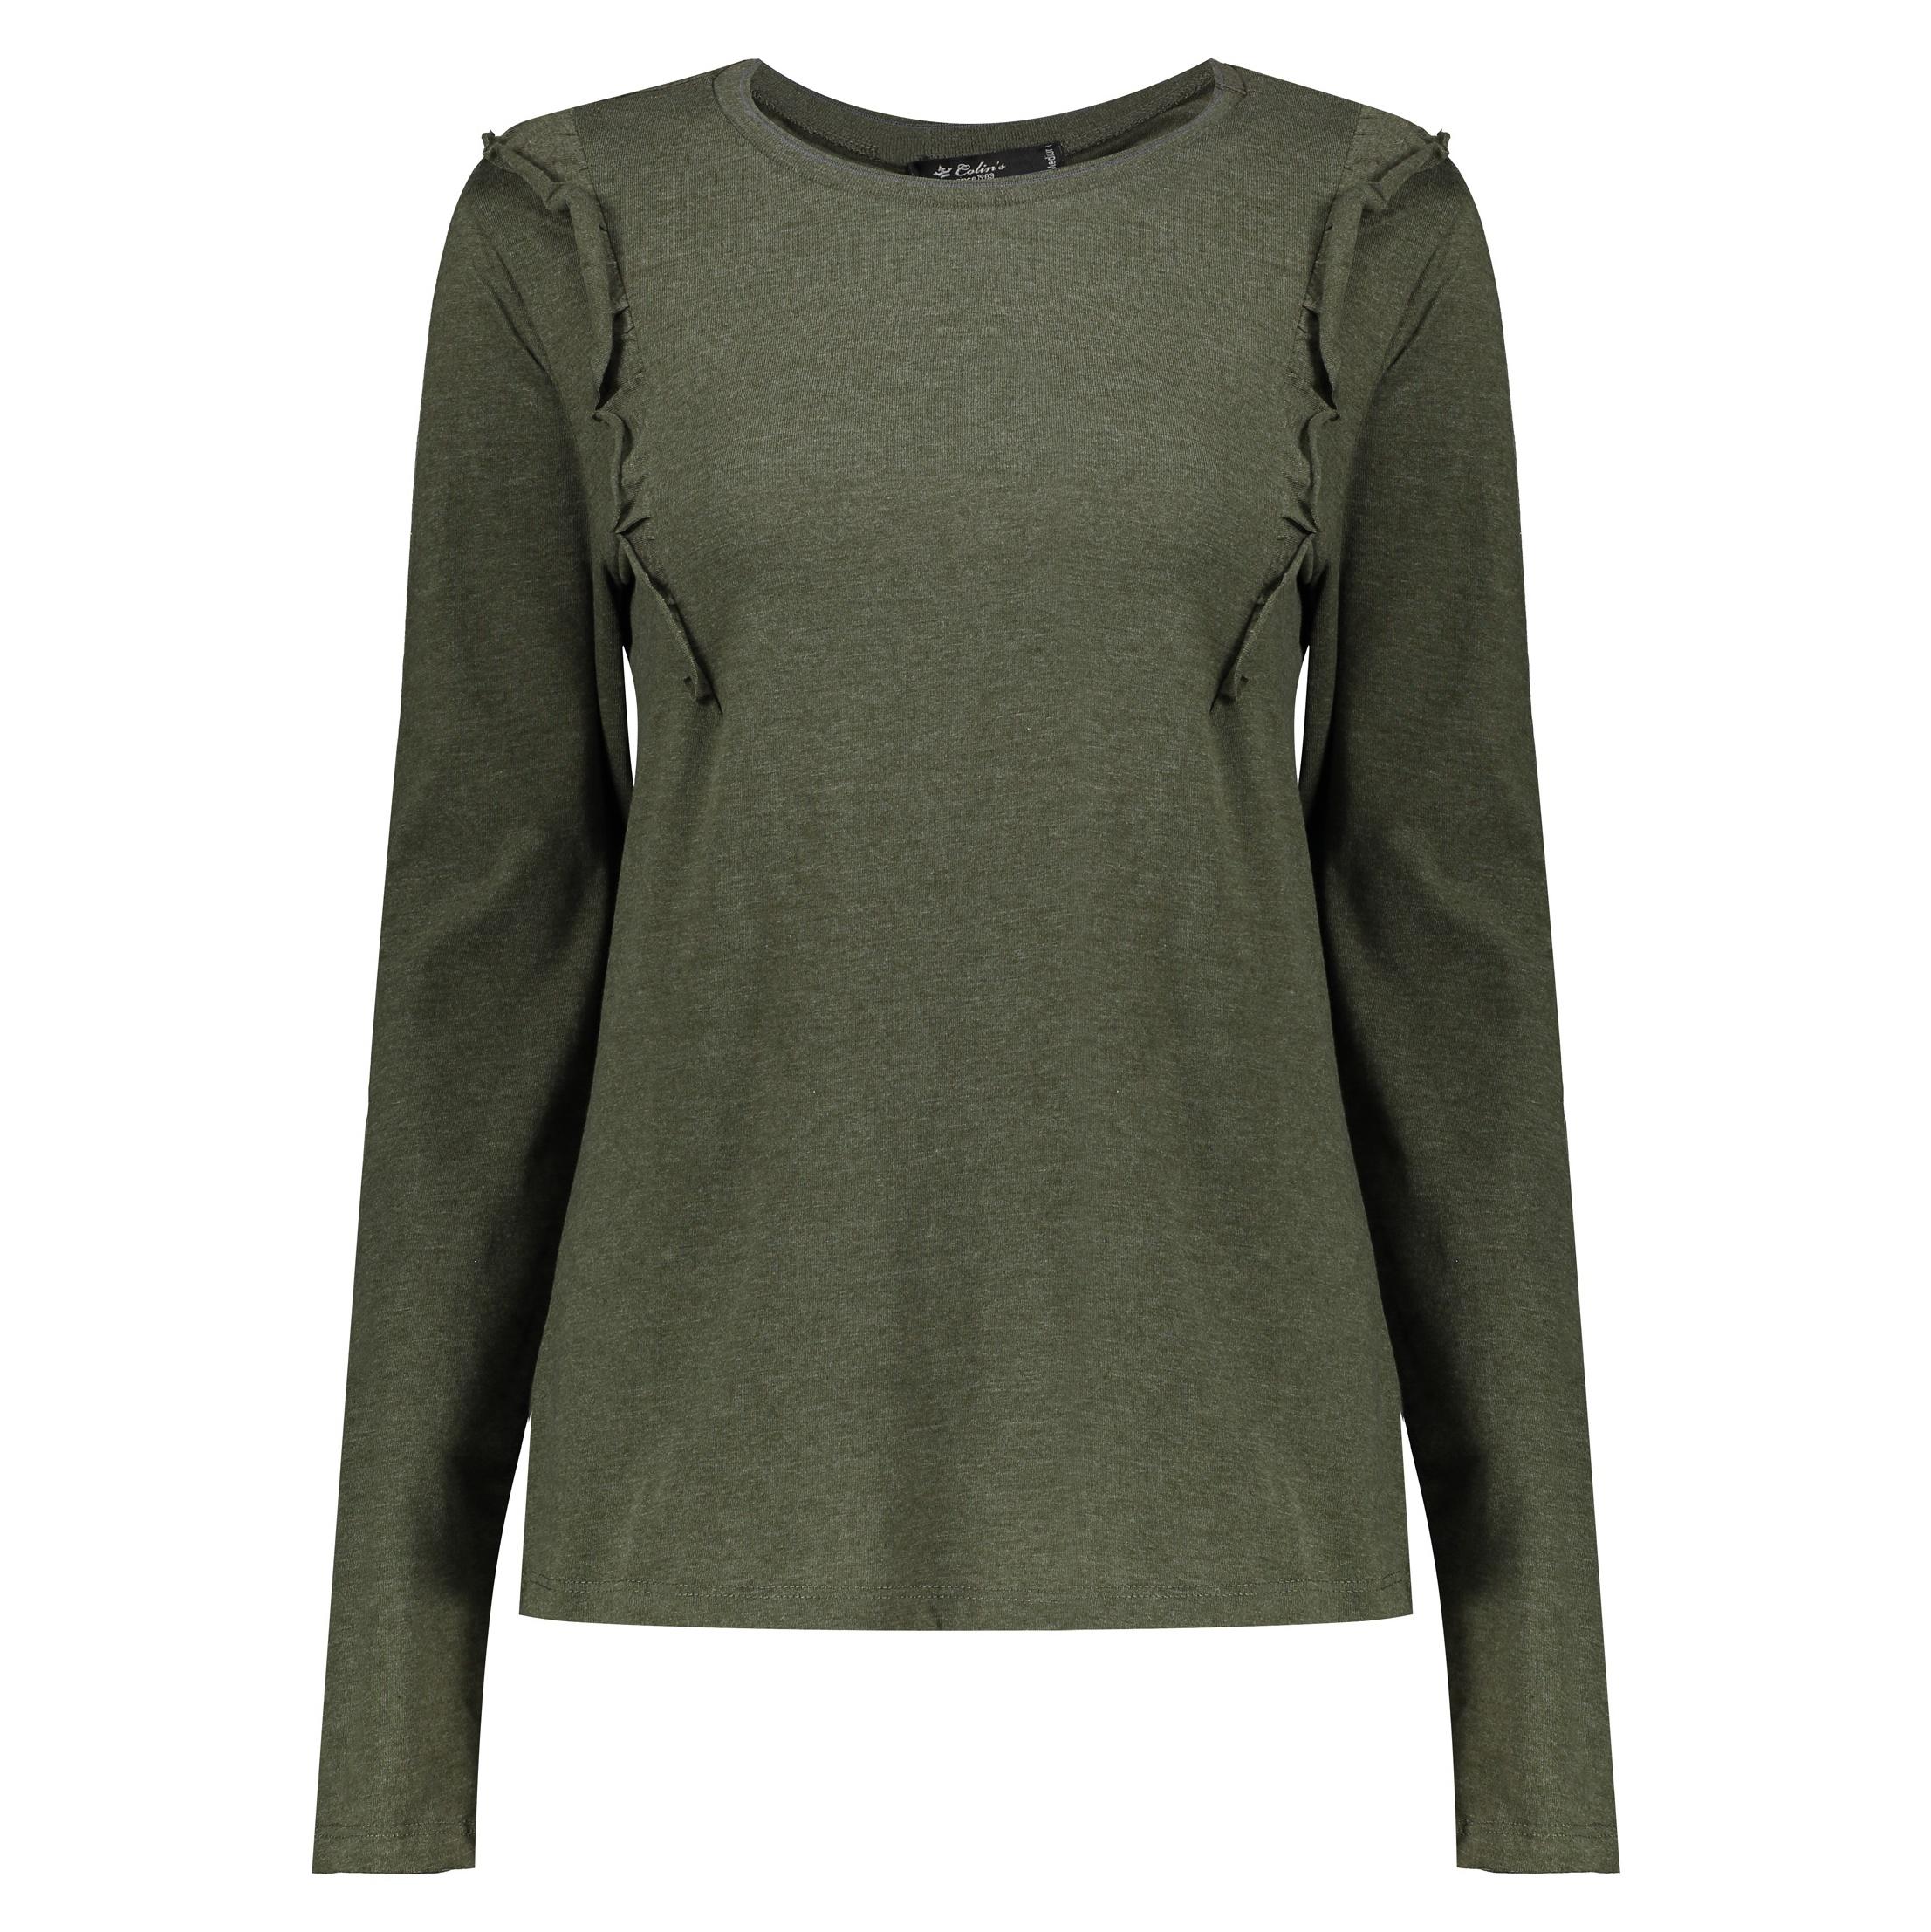 تی شرت نه کالینز مدل CL1030114-KML